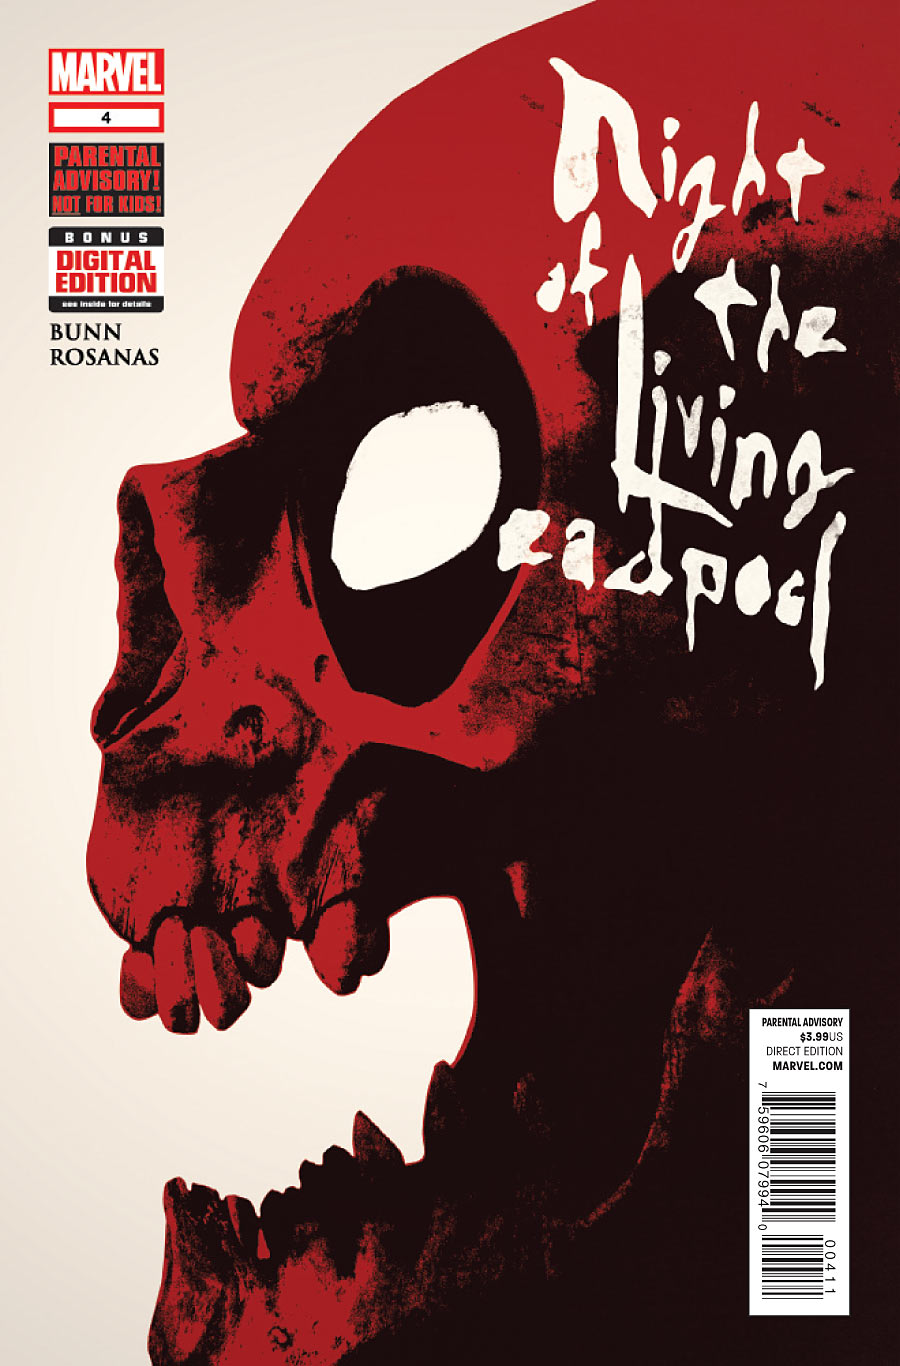 Night of the Living Deadpool Vol 1 4